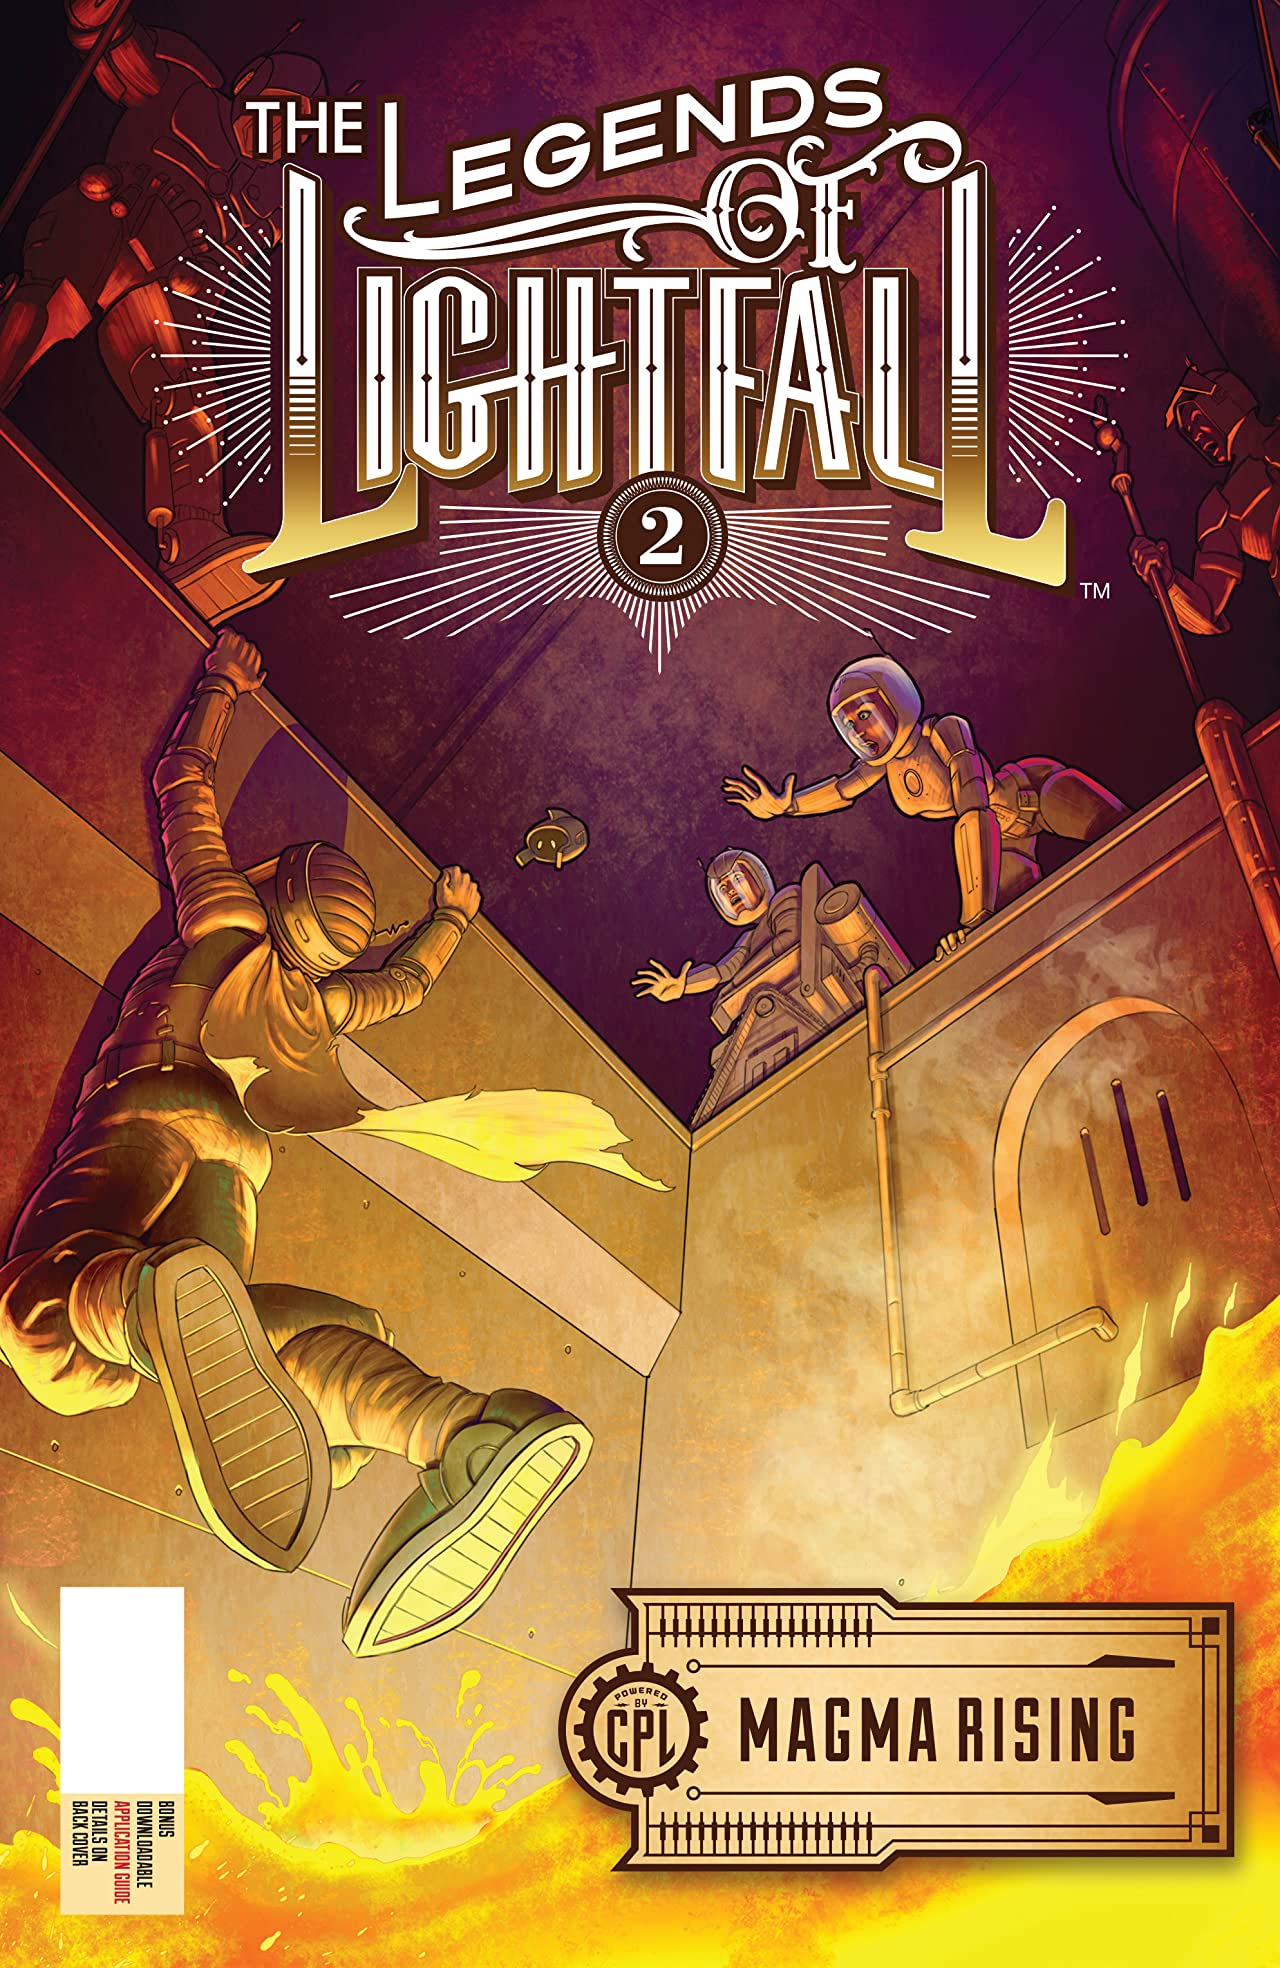 The Legends of Lightfall #2